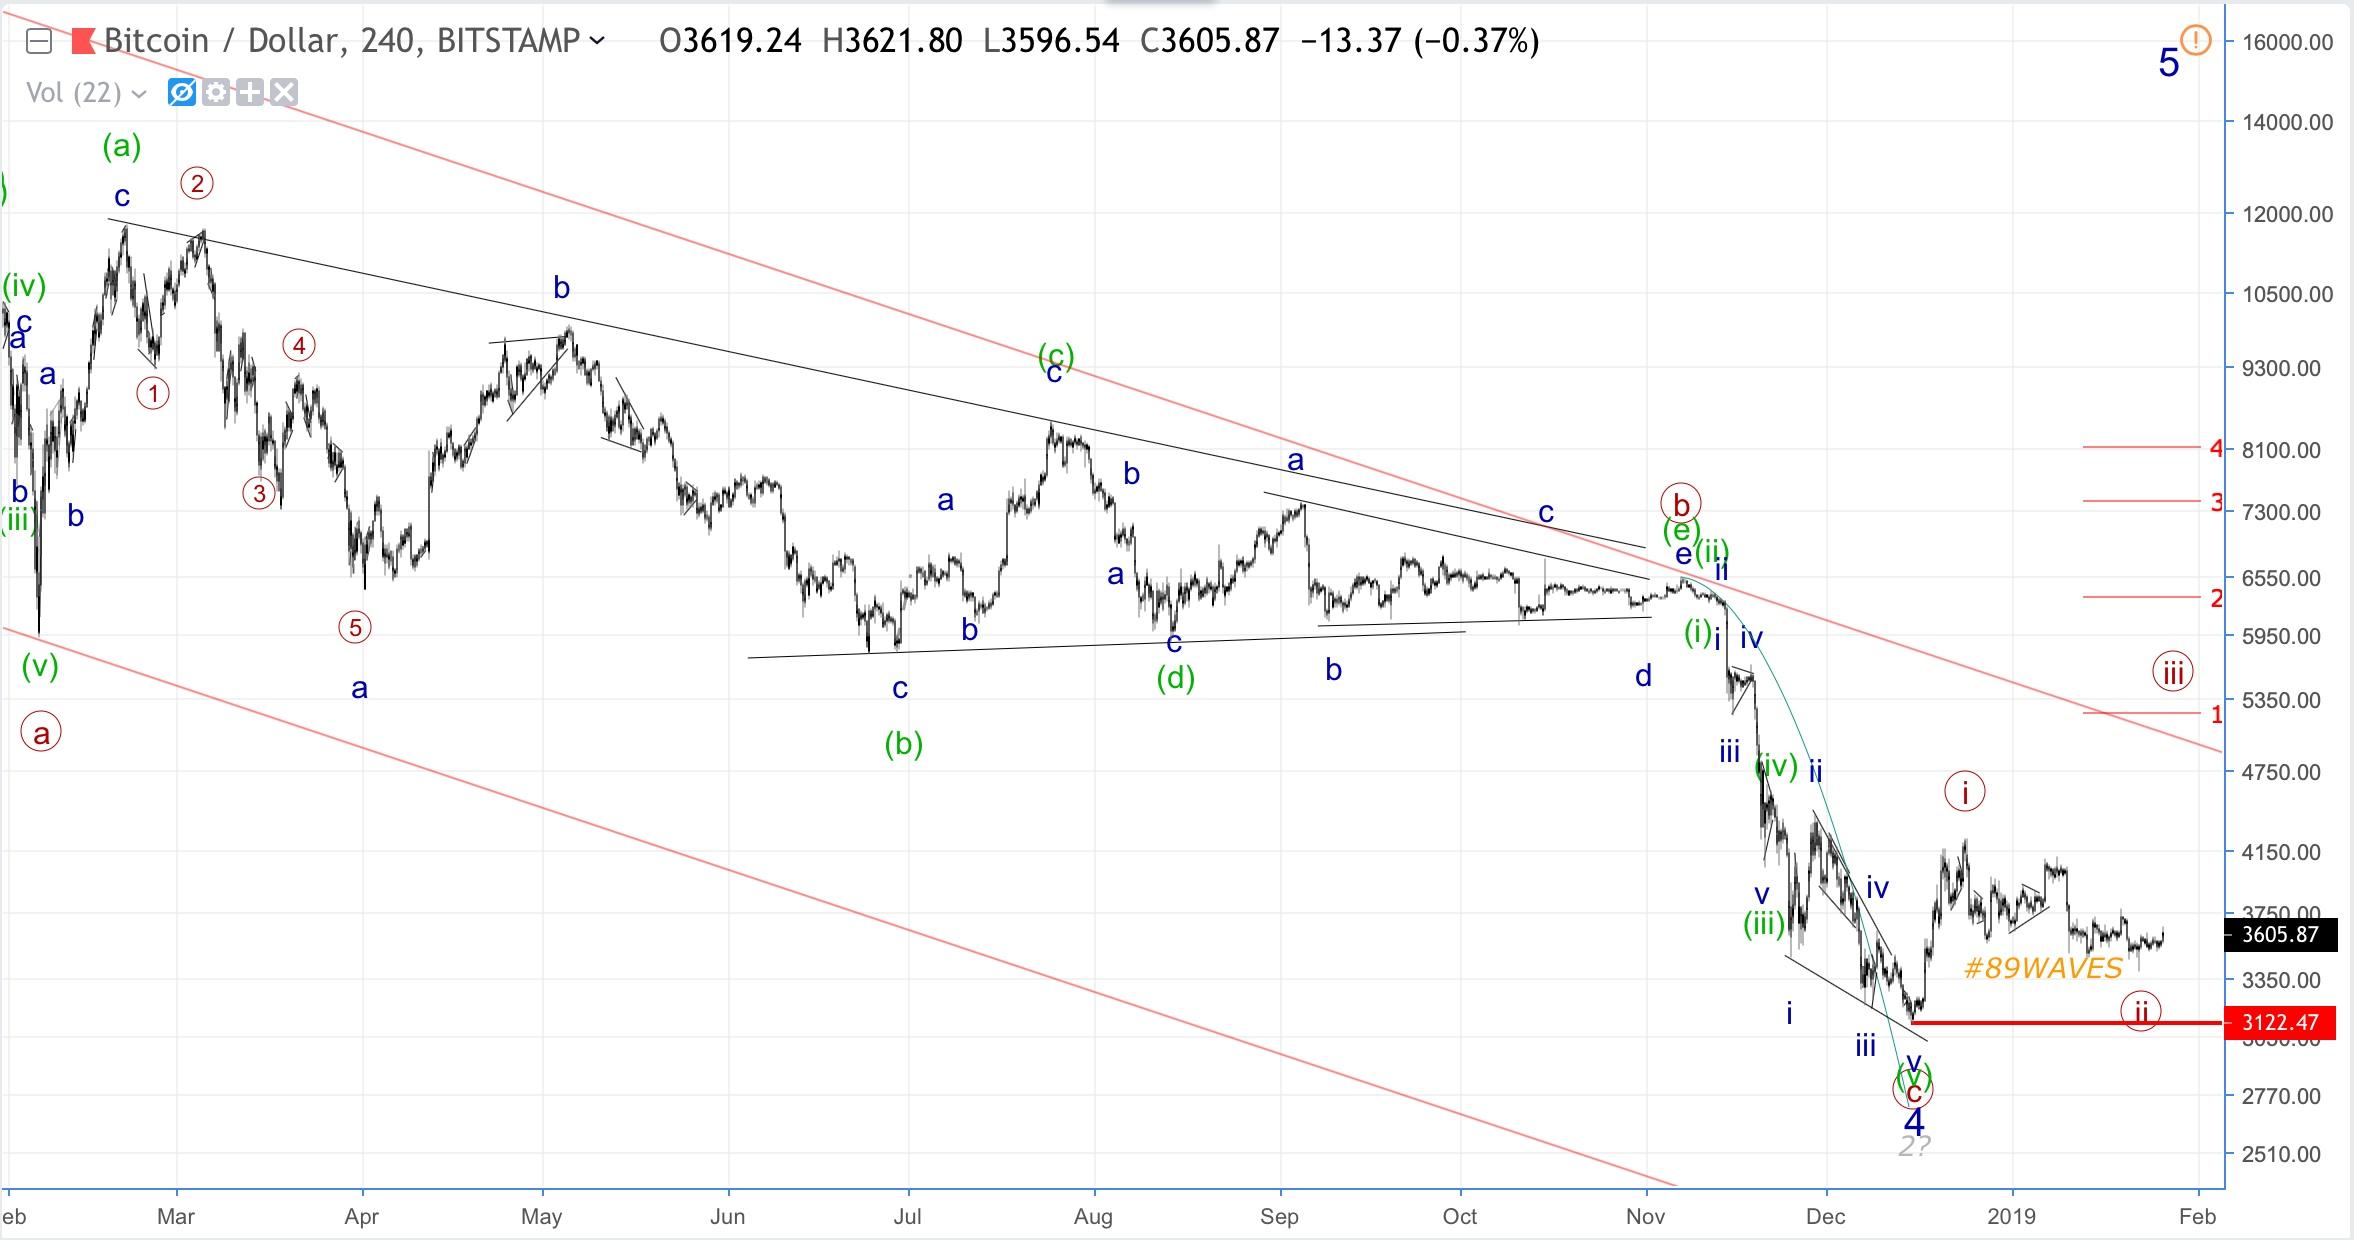 Волновой анализ Bitcoin, GBP/JPY и нефти Brent.